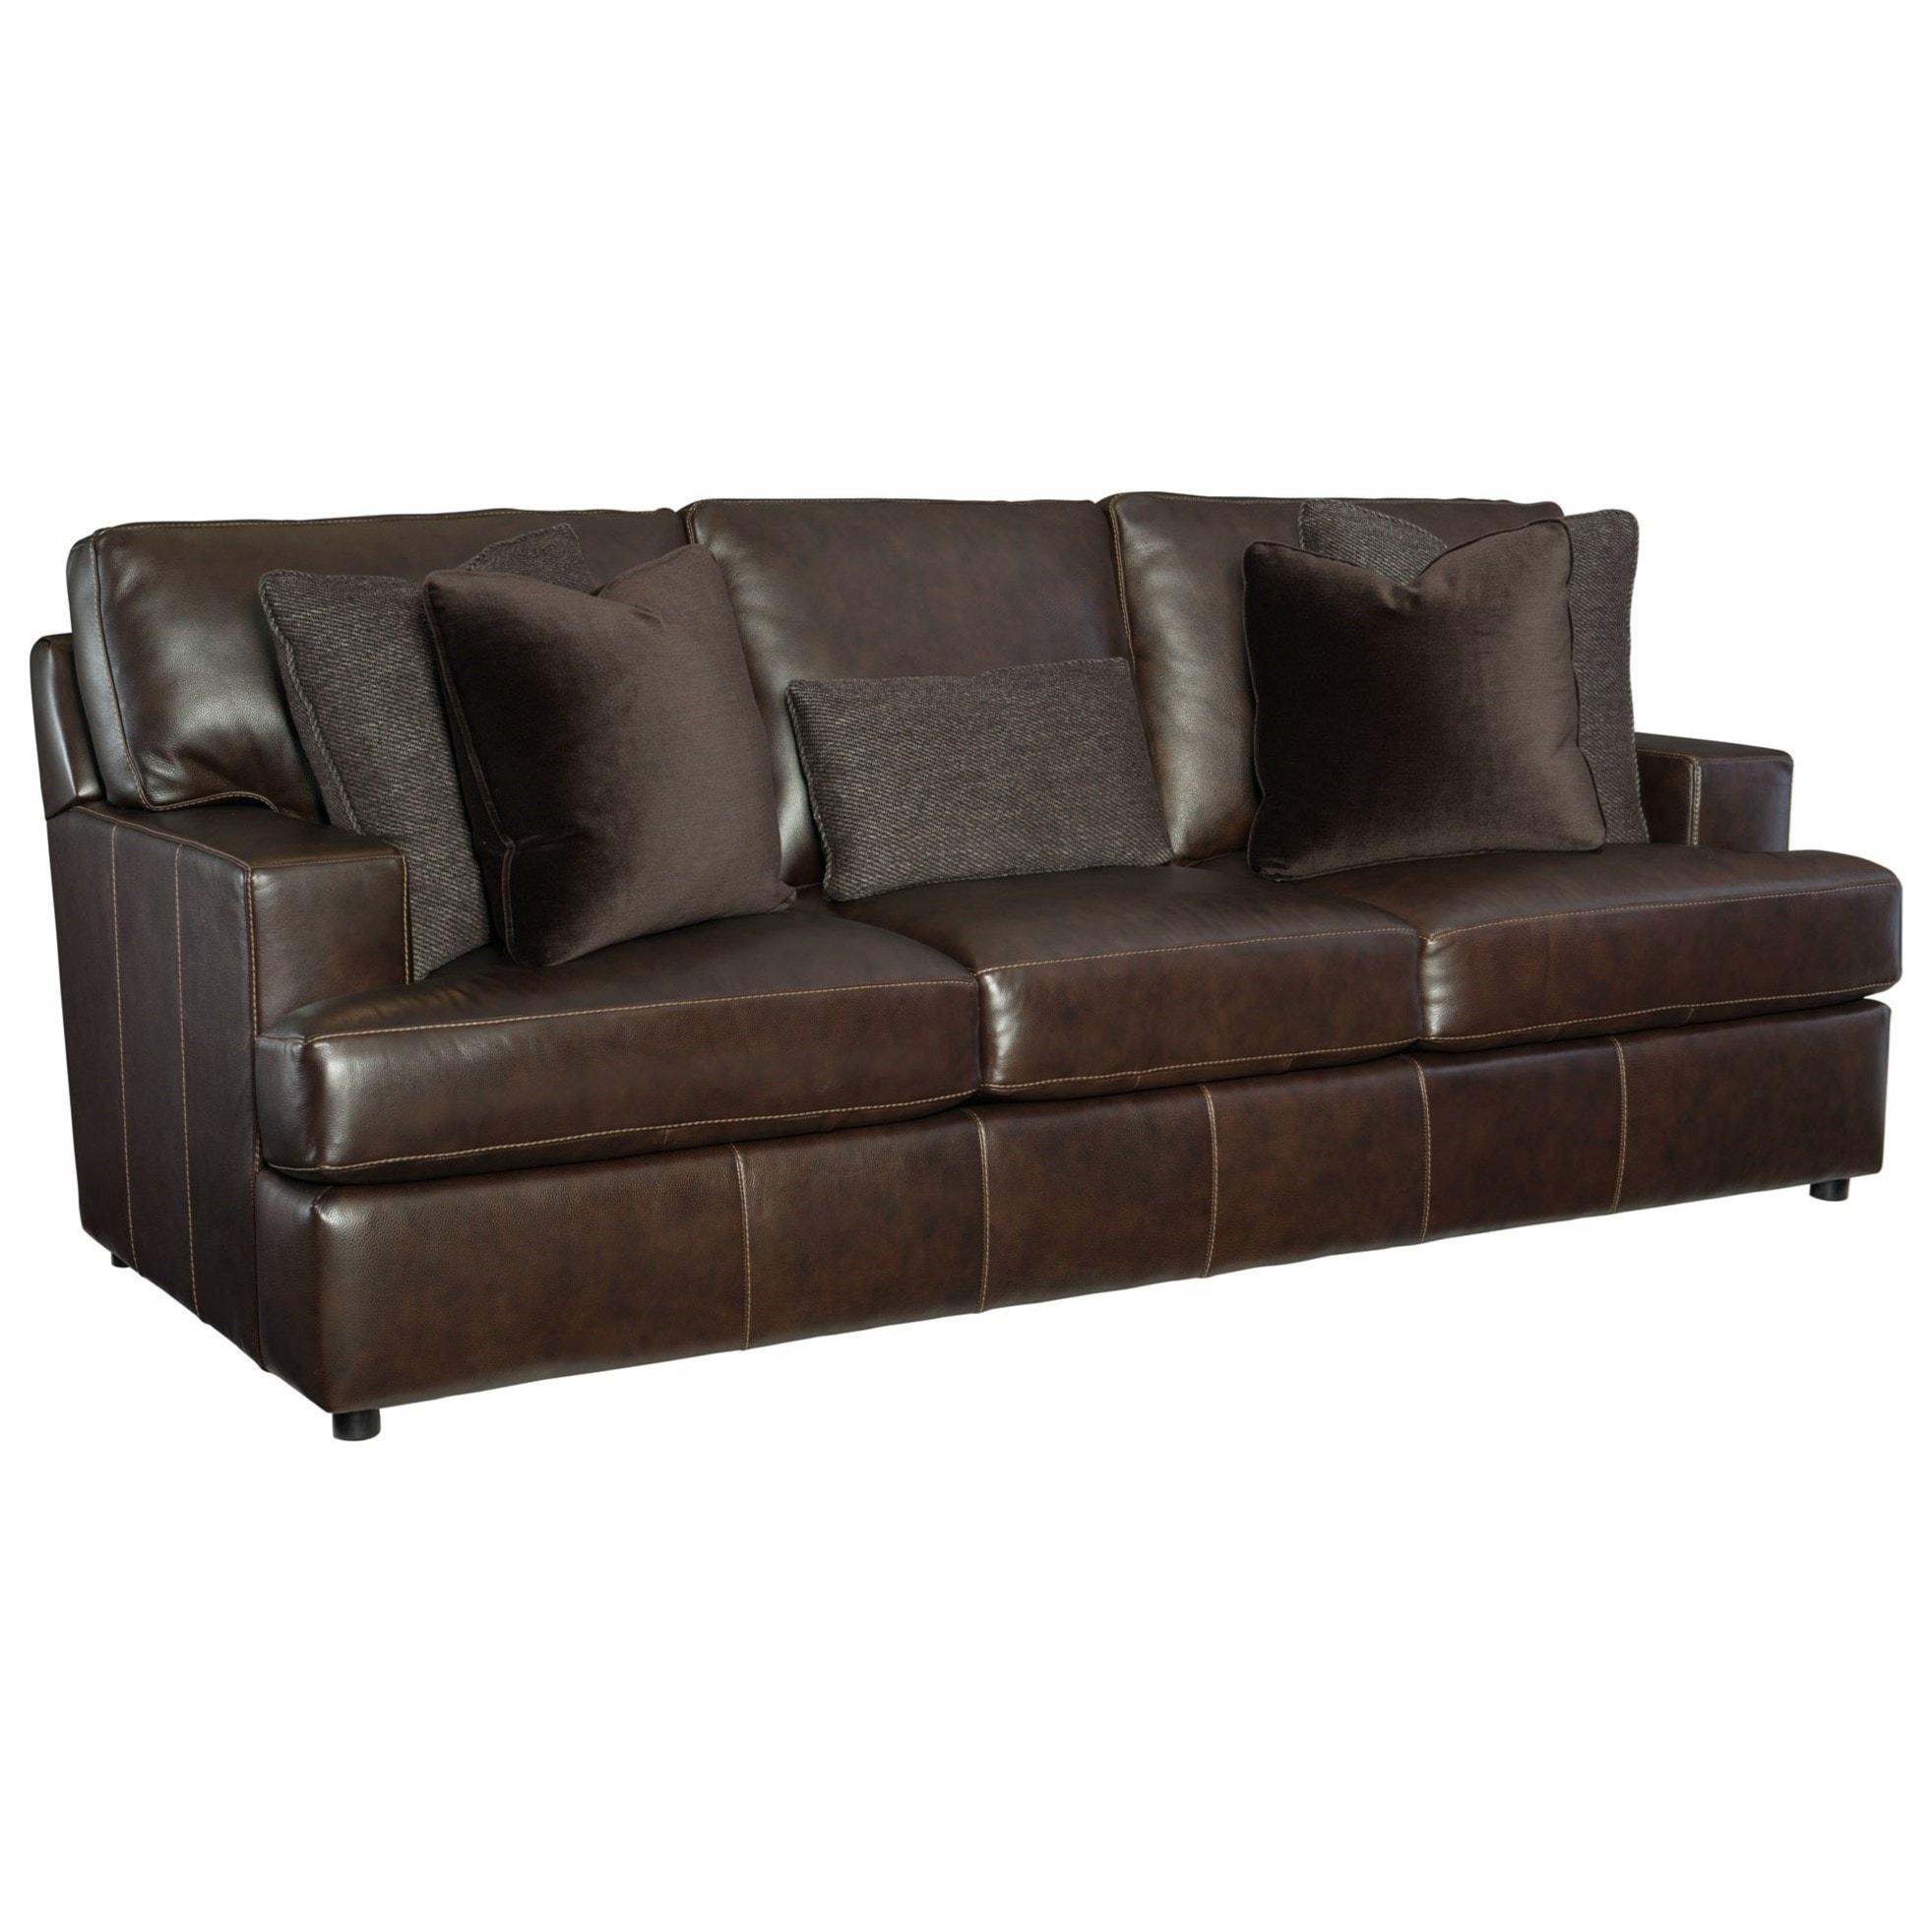 bernhardt furniture logo. Bernhardt WinslowSofa; WinslowSofa Furniture Logo